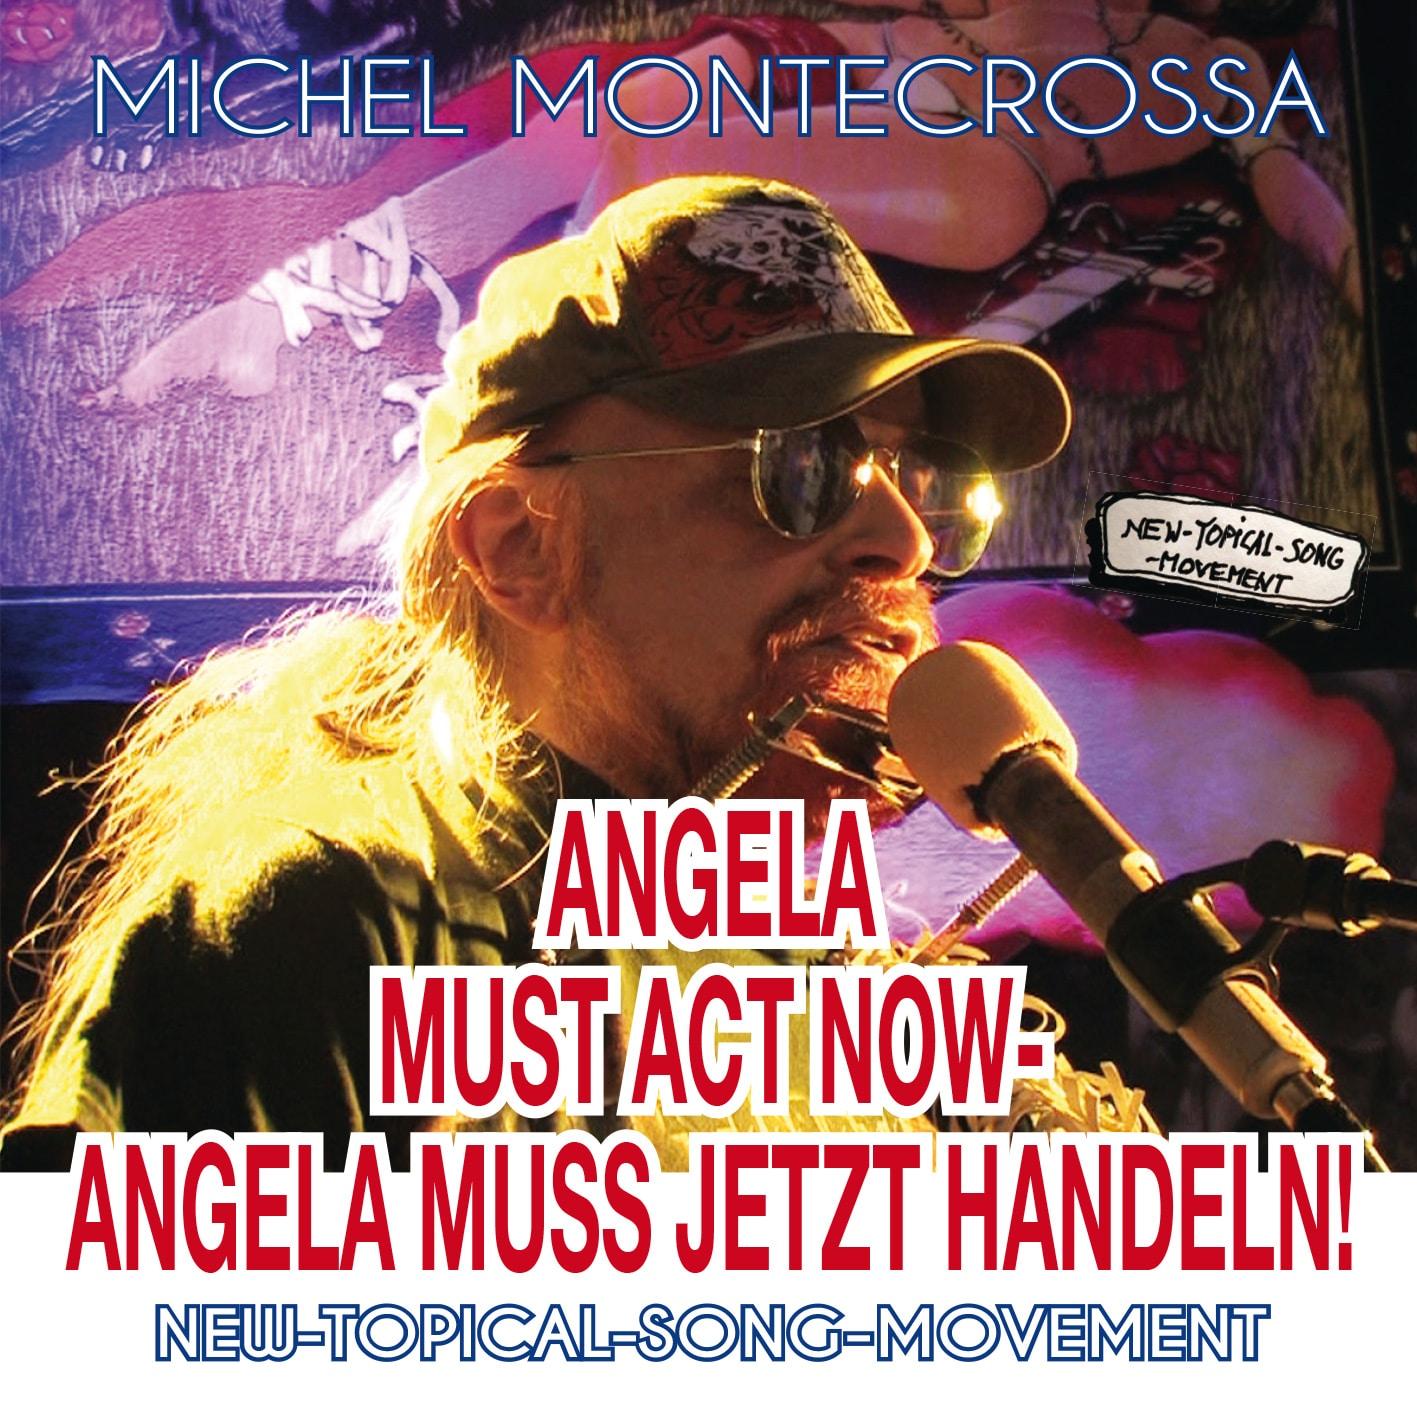 Angela Must Act Now - Angela Muss Jetzt Handeln!